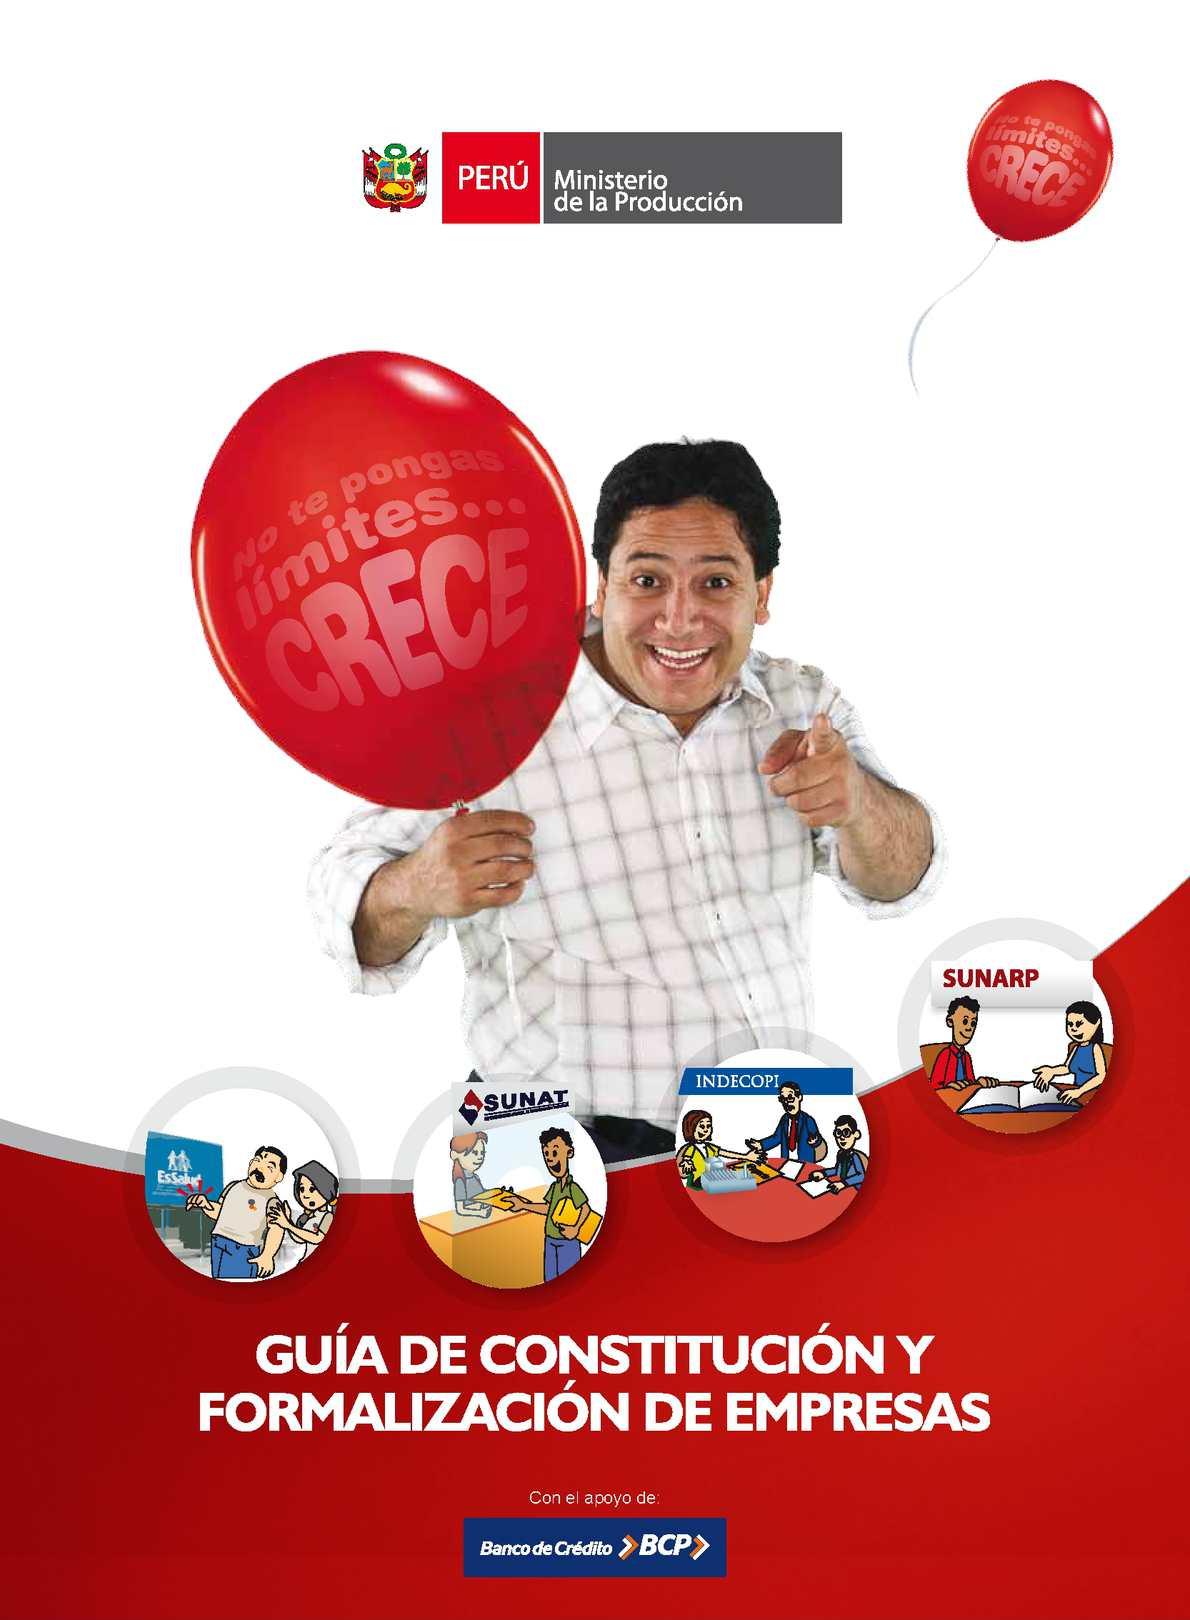 Calaméo - CONSTITUCION DE EMPRESA PERÚ 40e4cf2a211